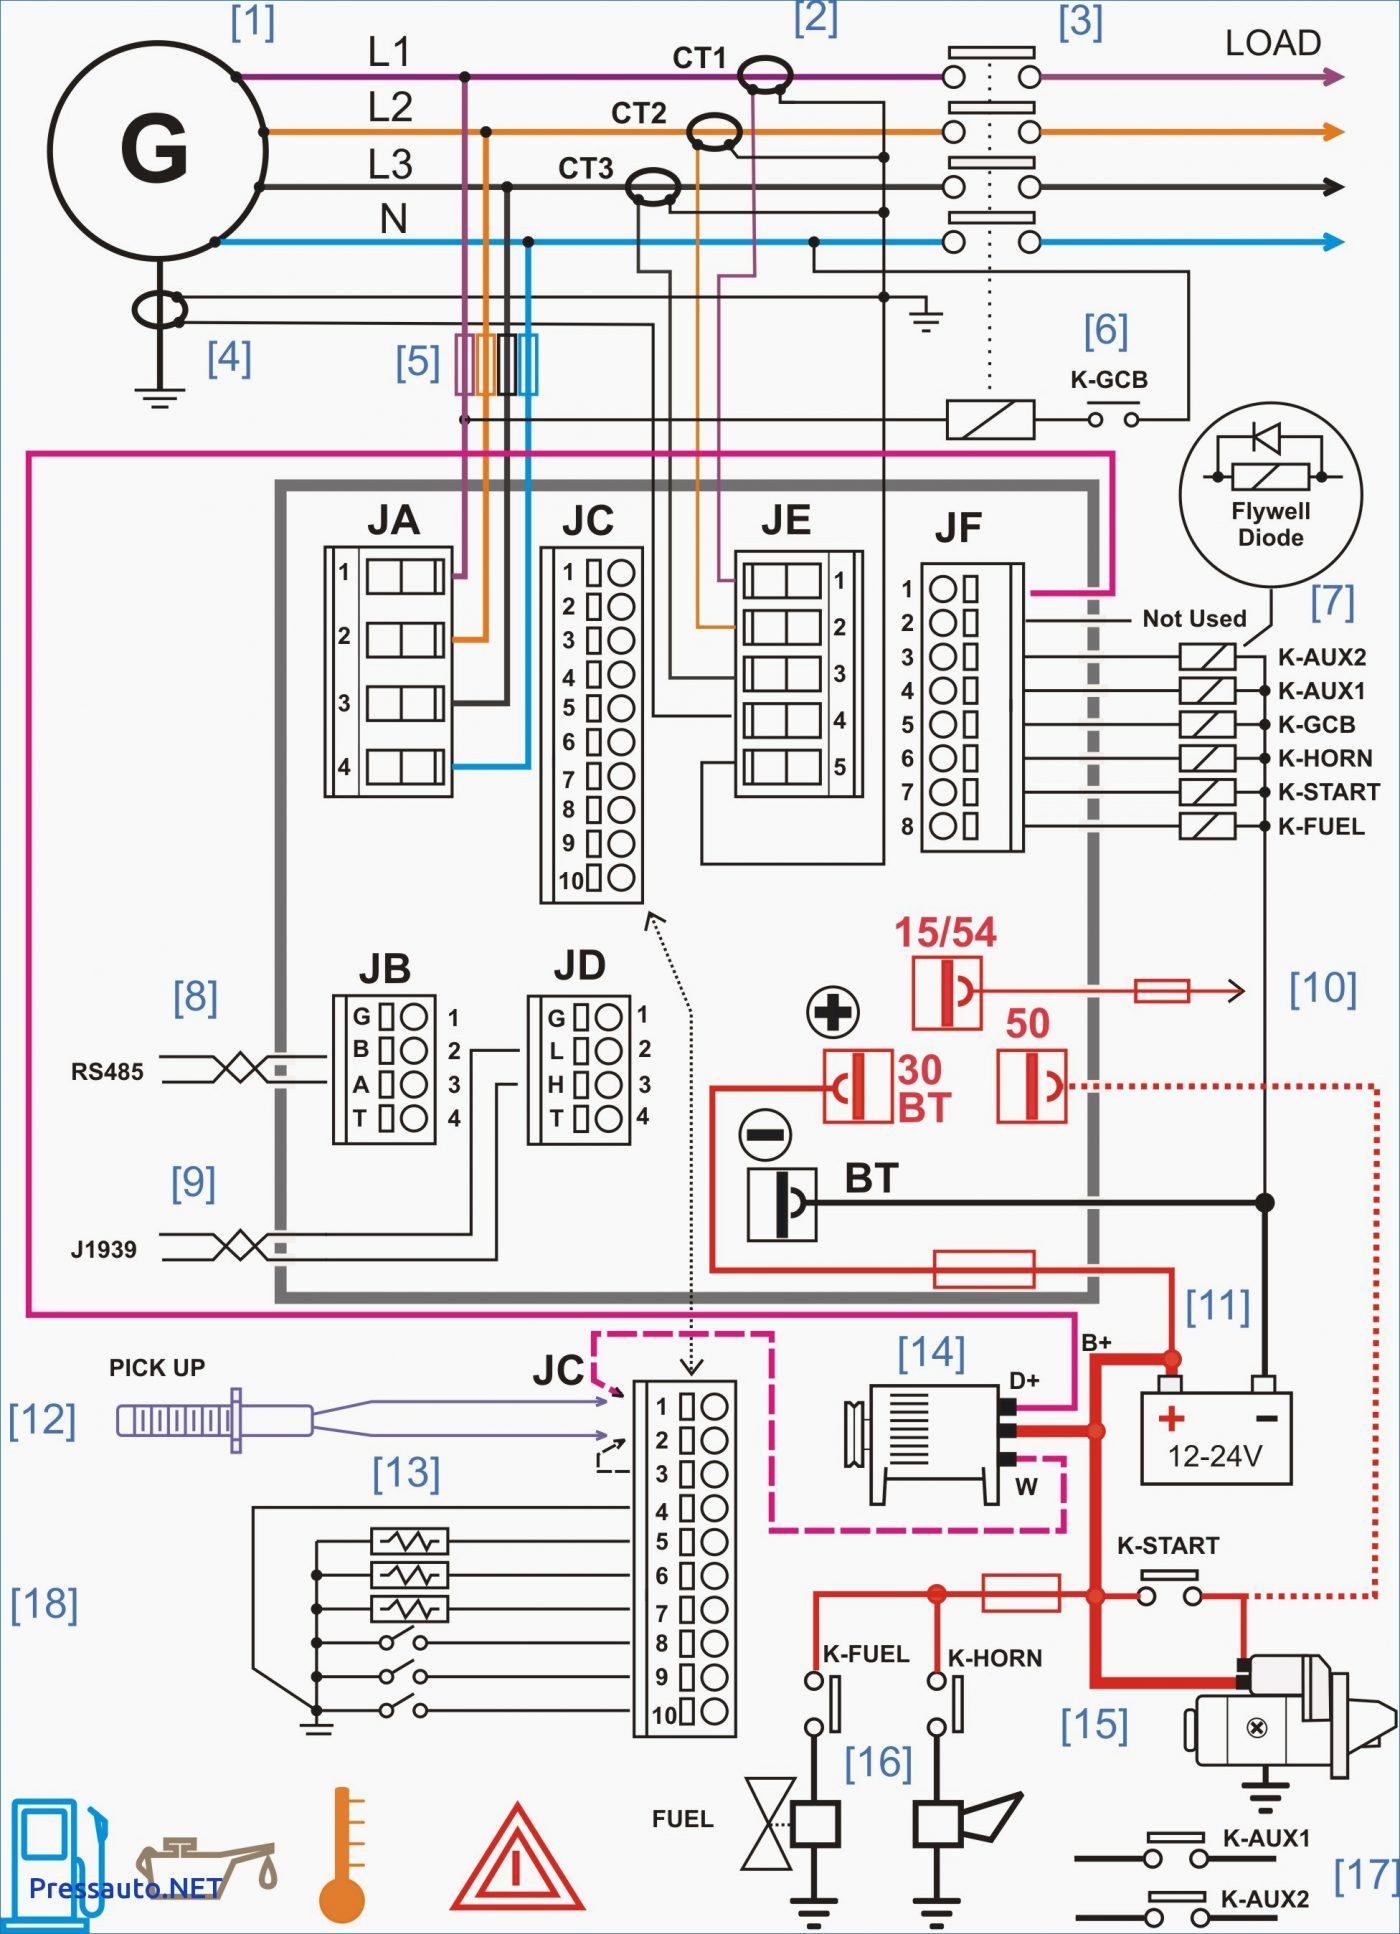 pwht wiring diagram schematics wiring diagrams u2022 rh seniorlivinguniversity co industrial electrical wiring standards industrial wiring standards pdf